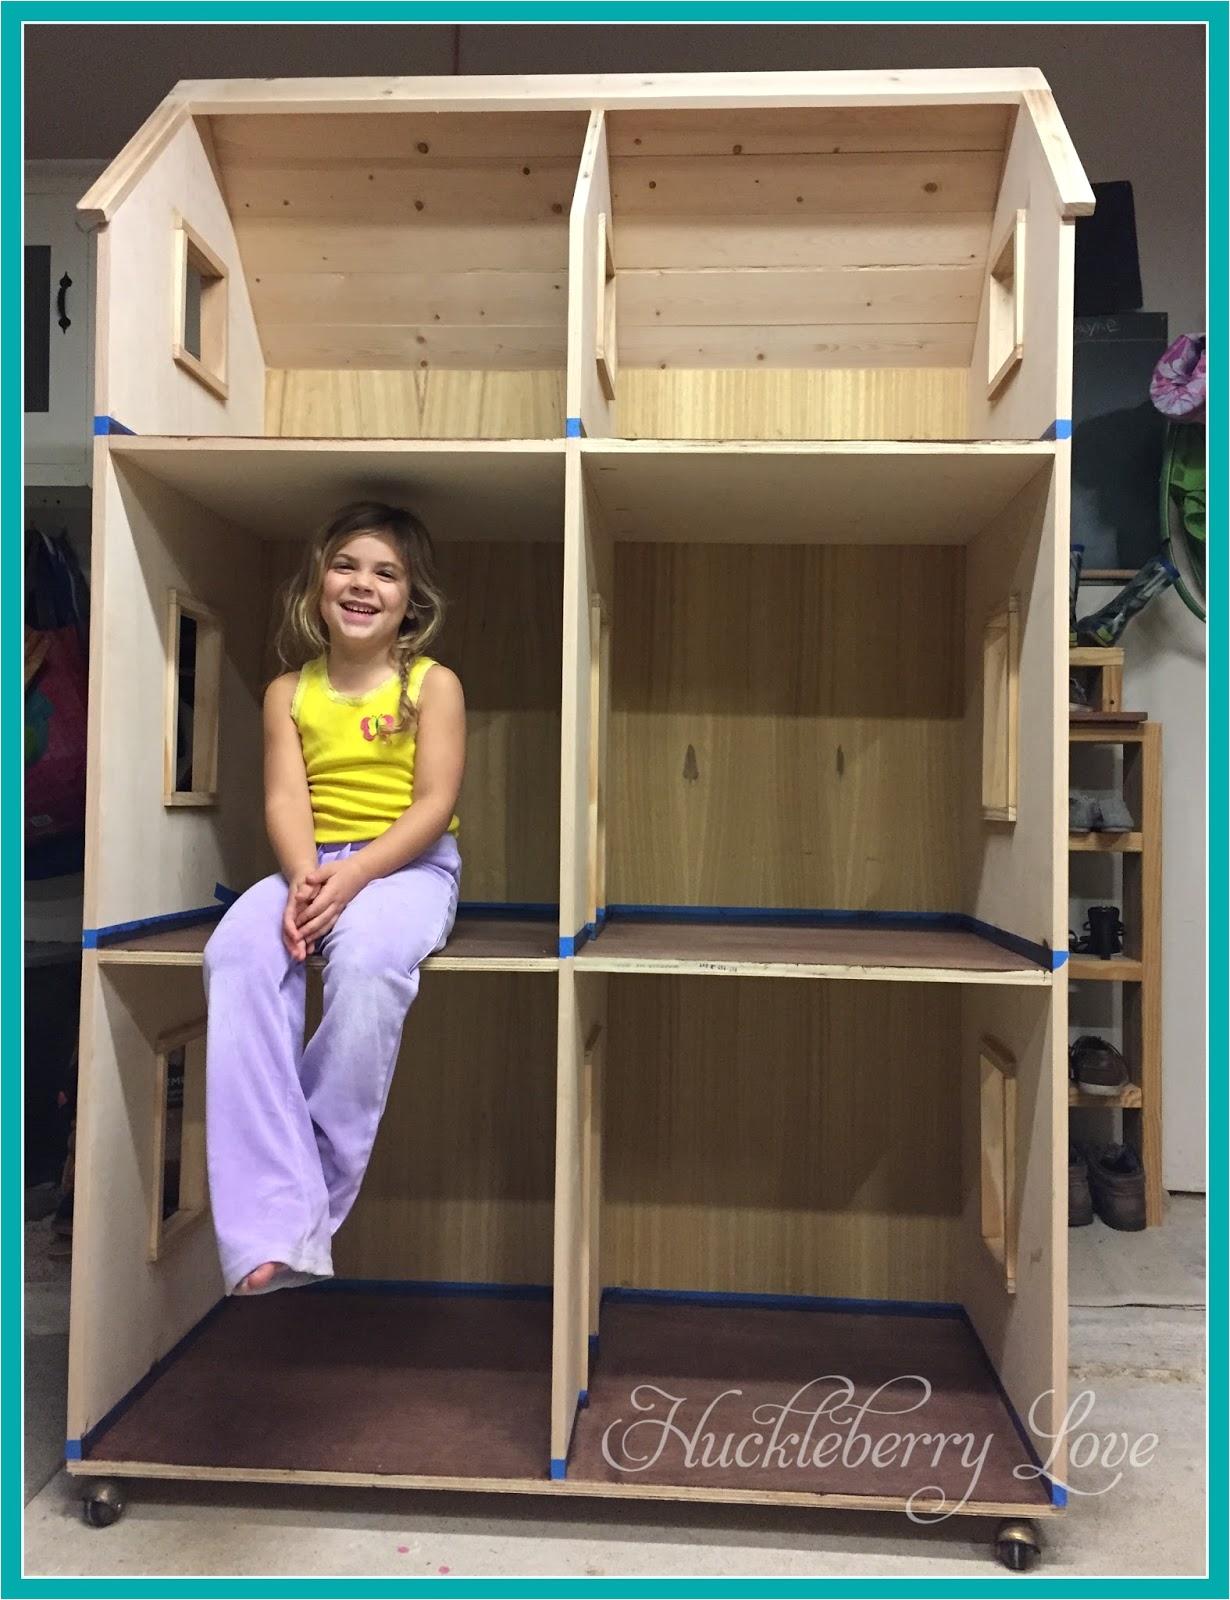 american girl dollhouse plans pdf american girl dollhouse plans 18 inch doll furniture diy bibserver